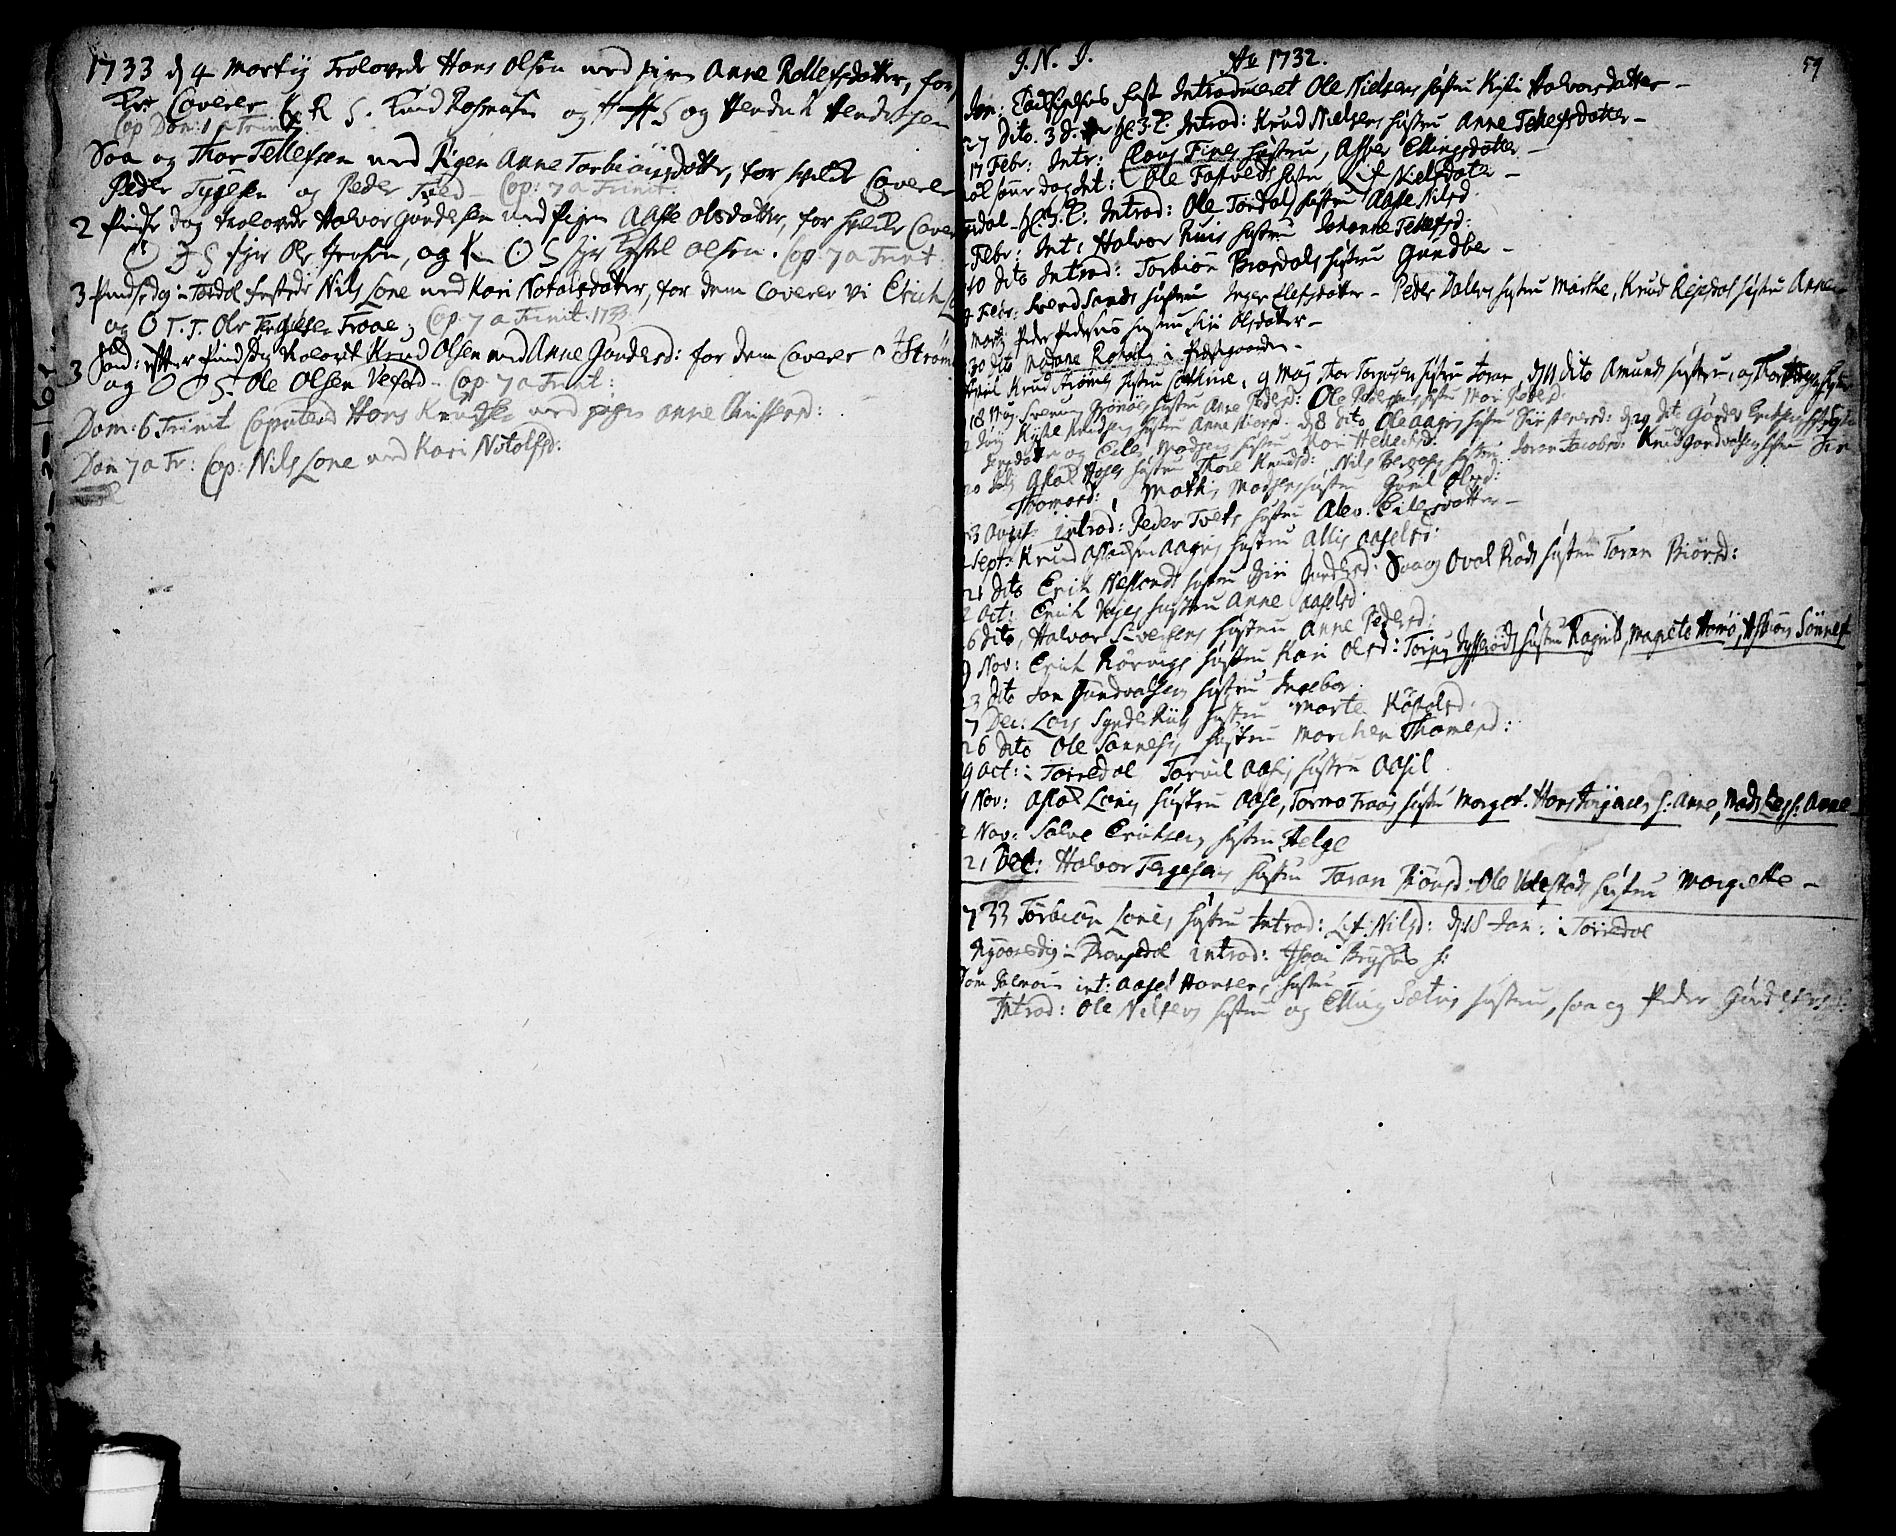 SAKO, Drangedal kirkebøker, F/Fa/L0001: Ministerialbok nr. 1, 1697-1767, s. 59